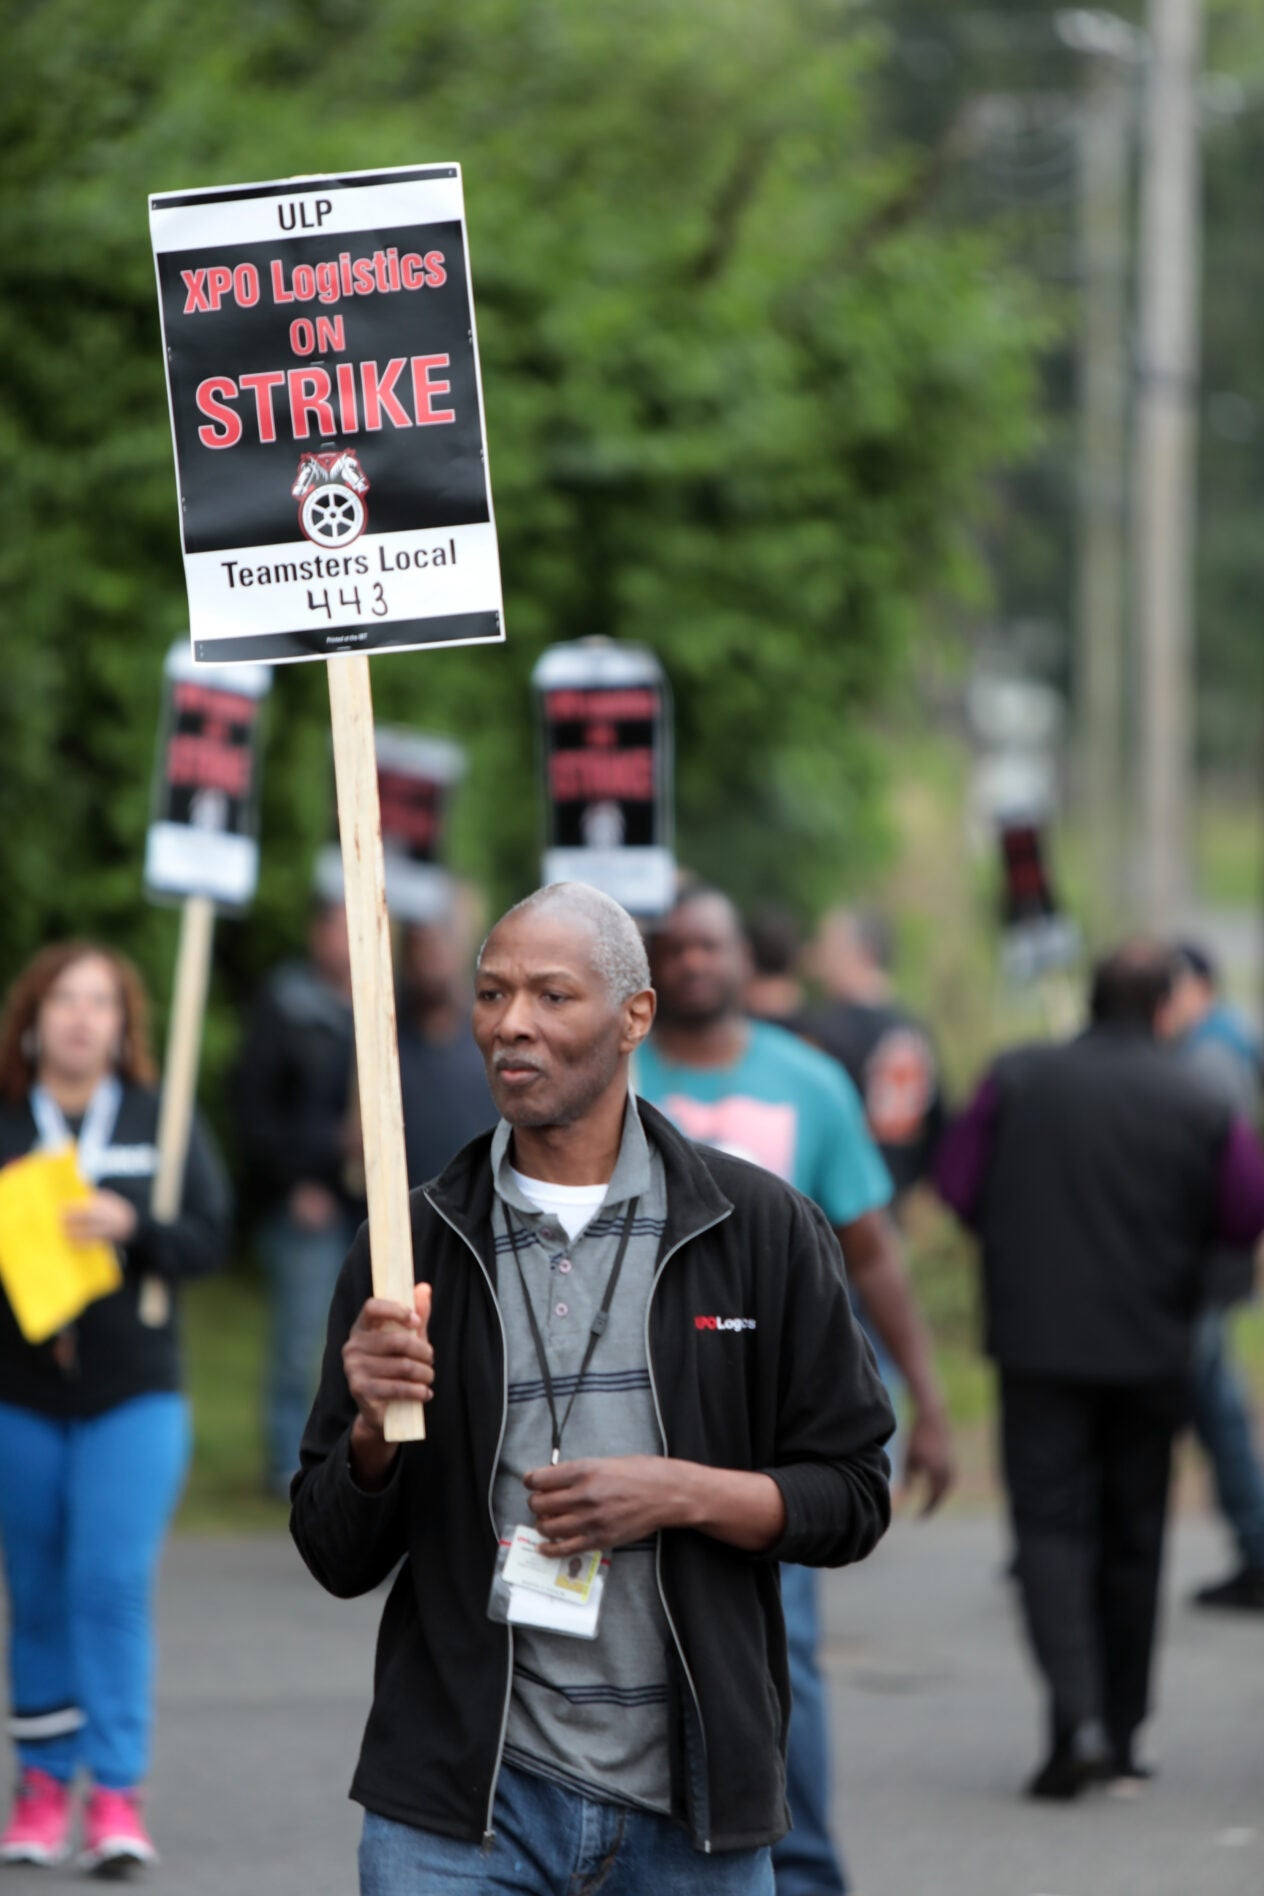 XPO logistics strike, Local 443, May, 2019